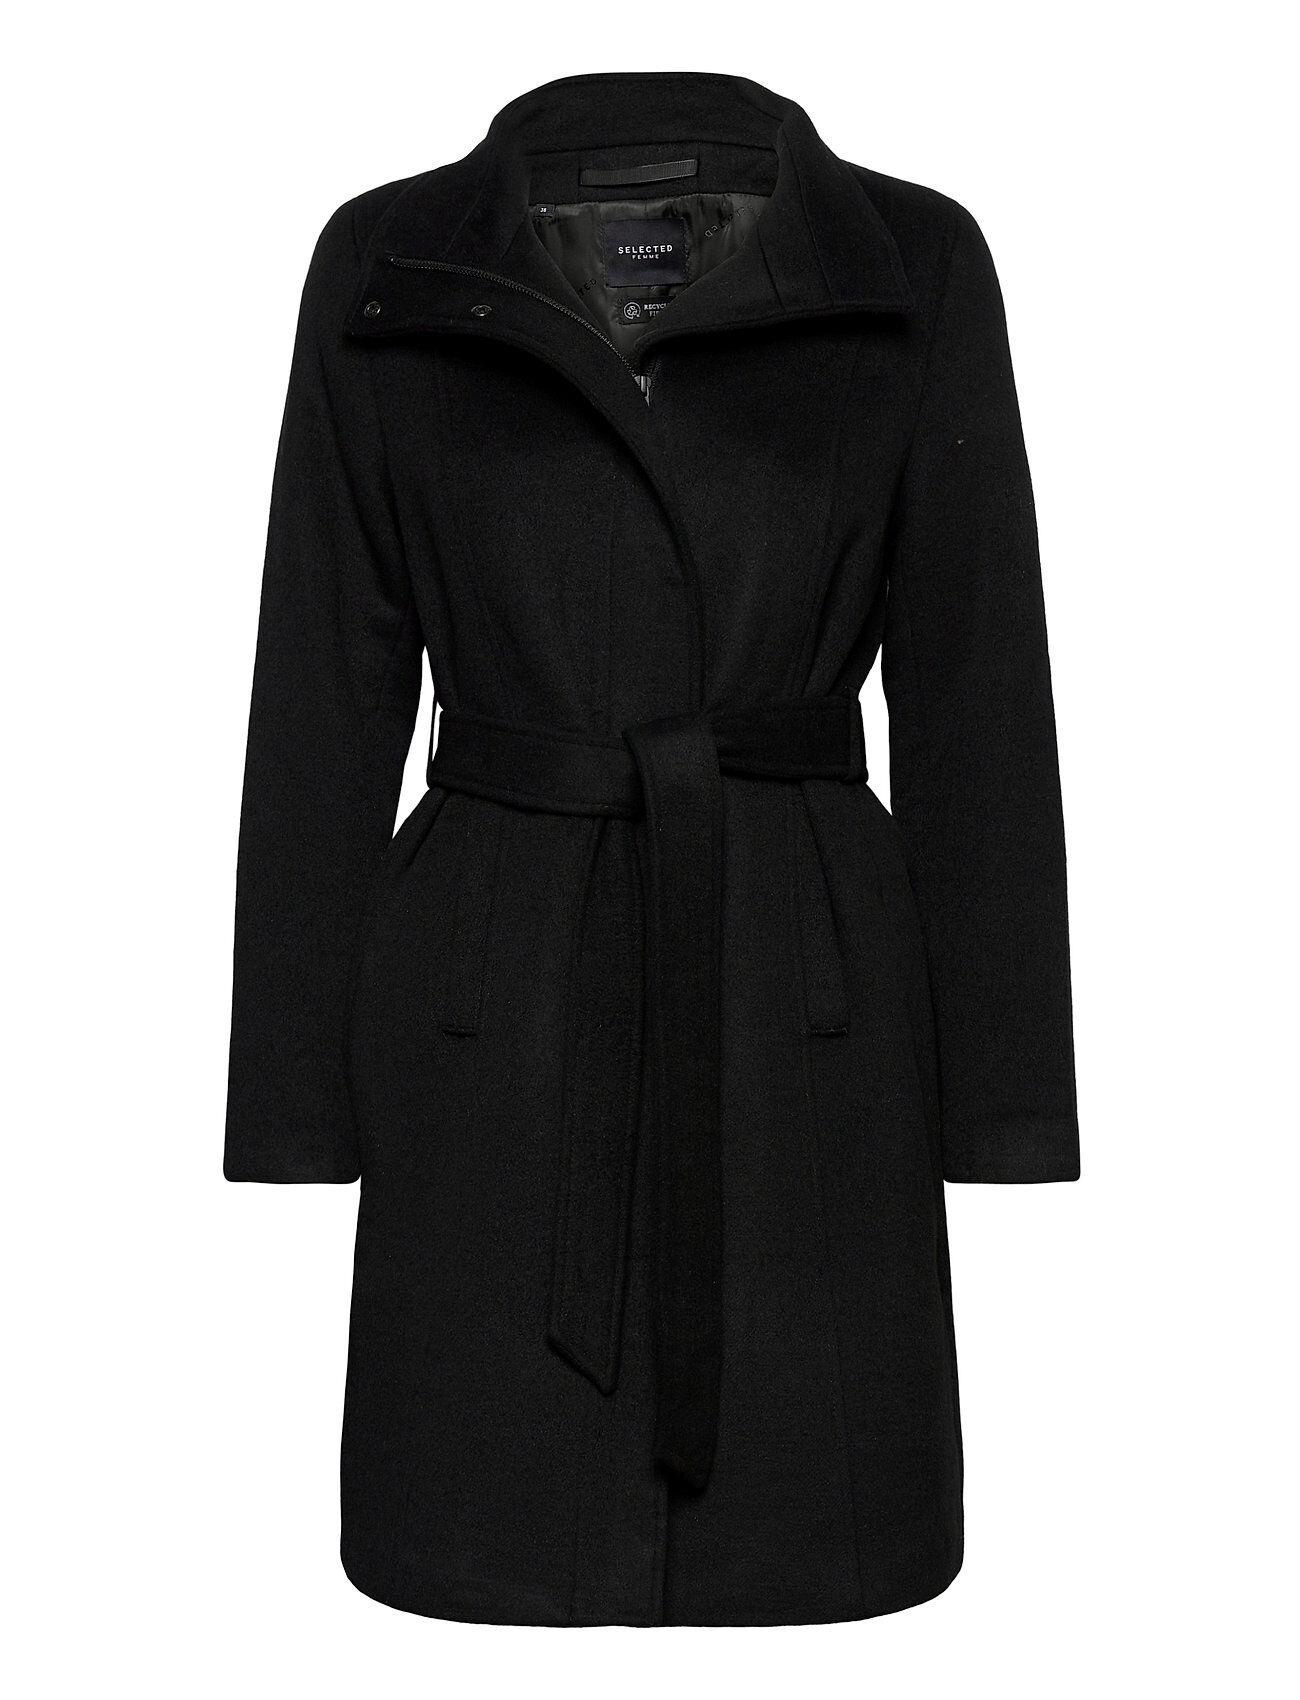 Selected Femme Slfmelanie Wool Coat B Villakangastakki Pitkä Takki Musta Selected Femme